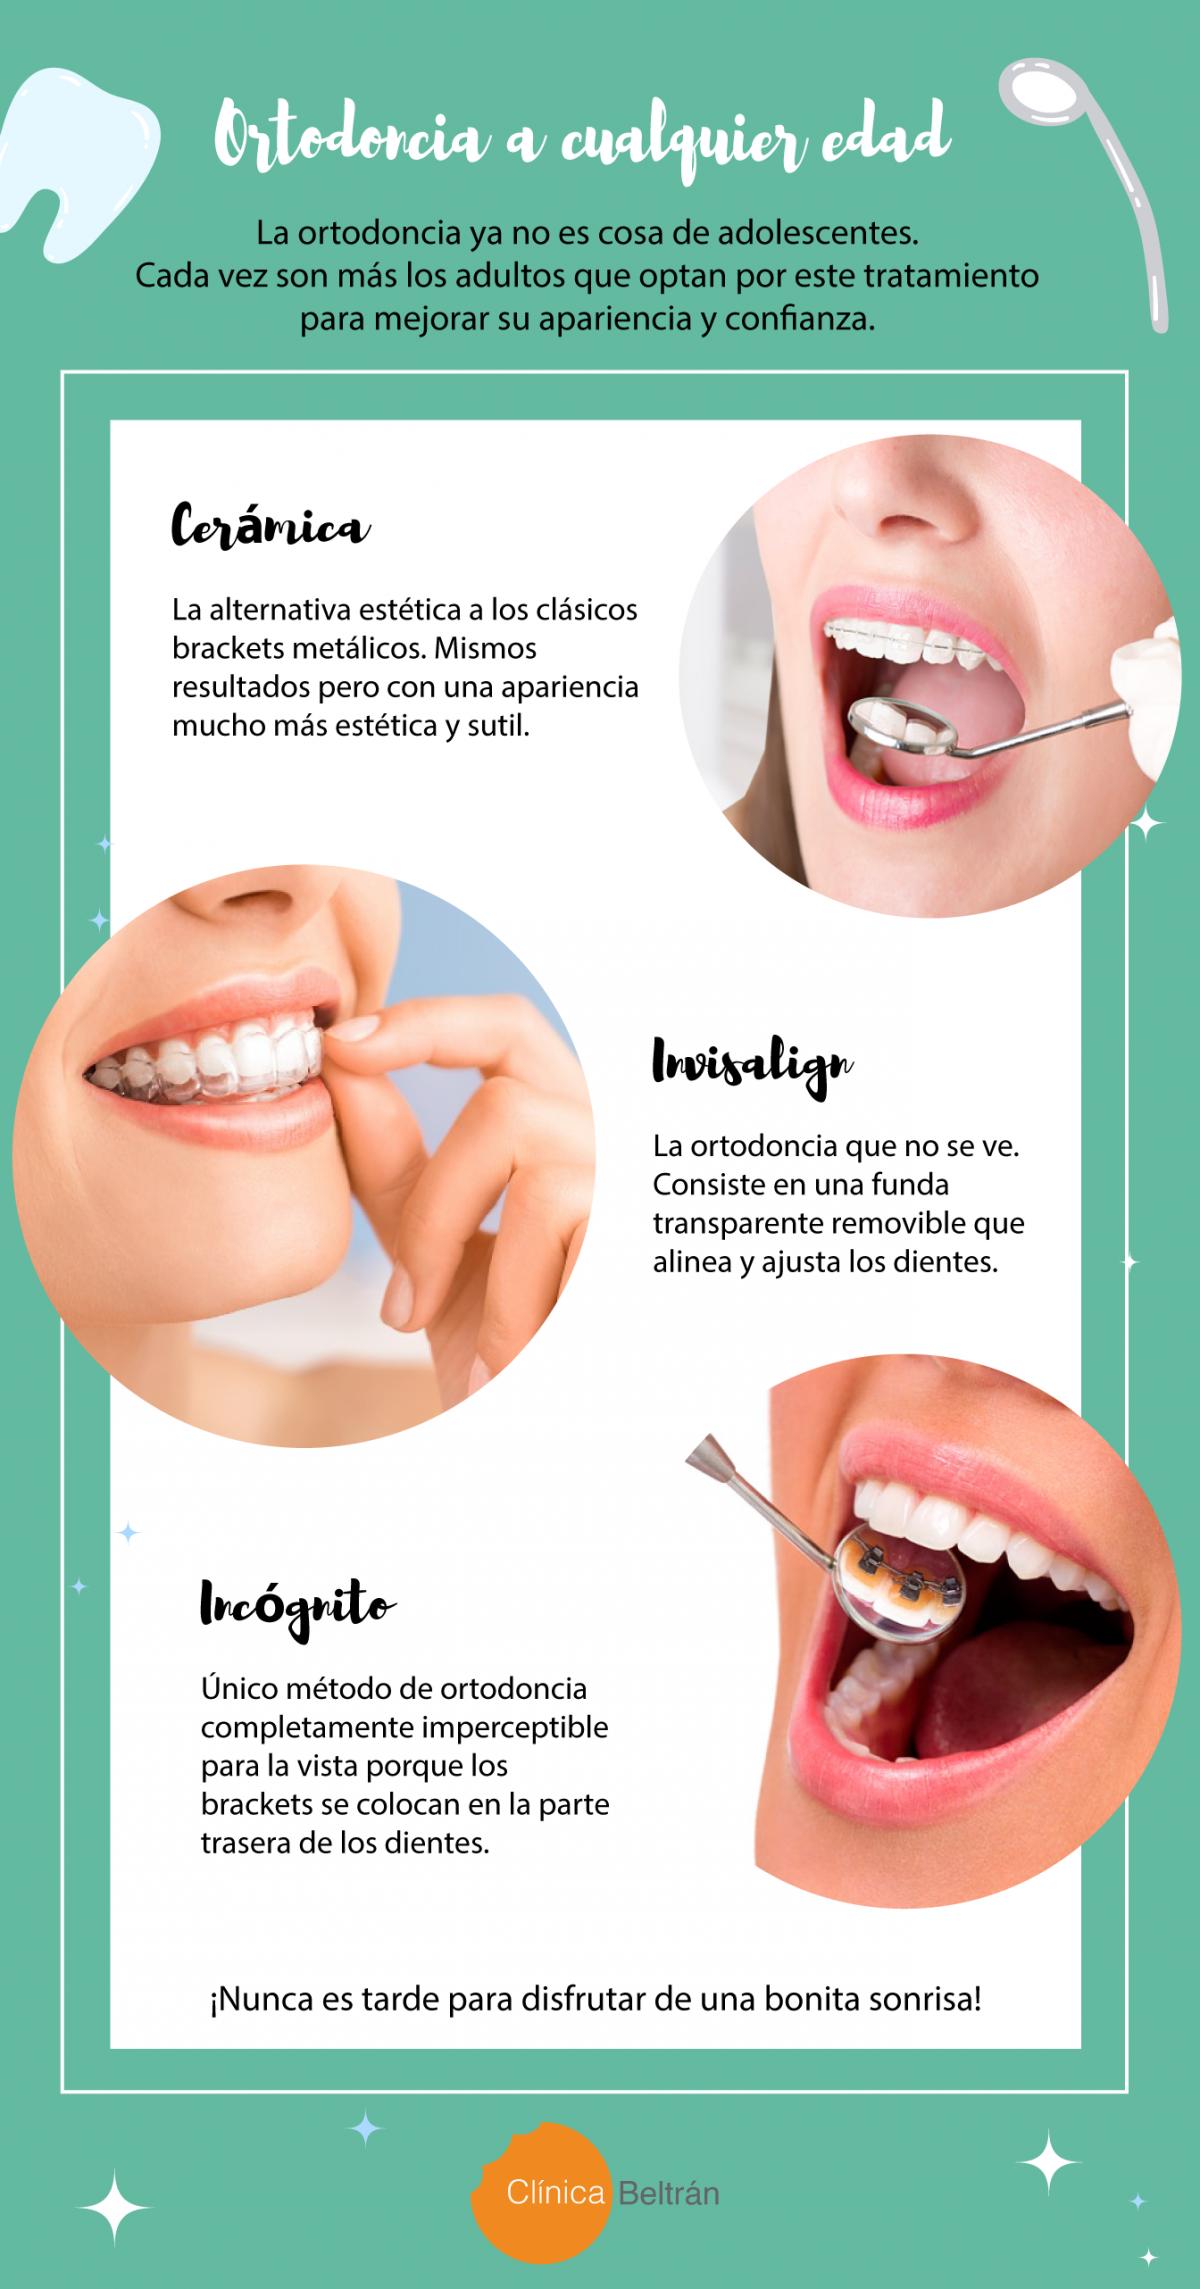 Ortodoncia estética, cada vez más usada por adultos